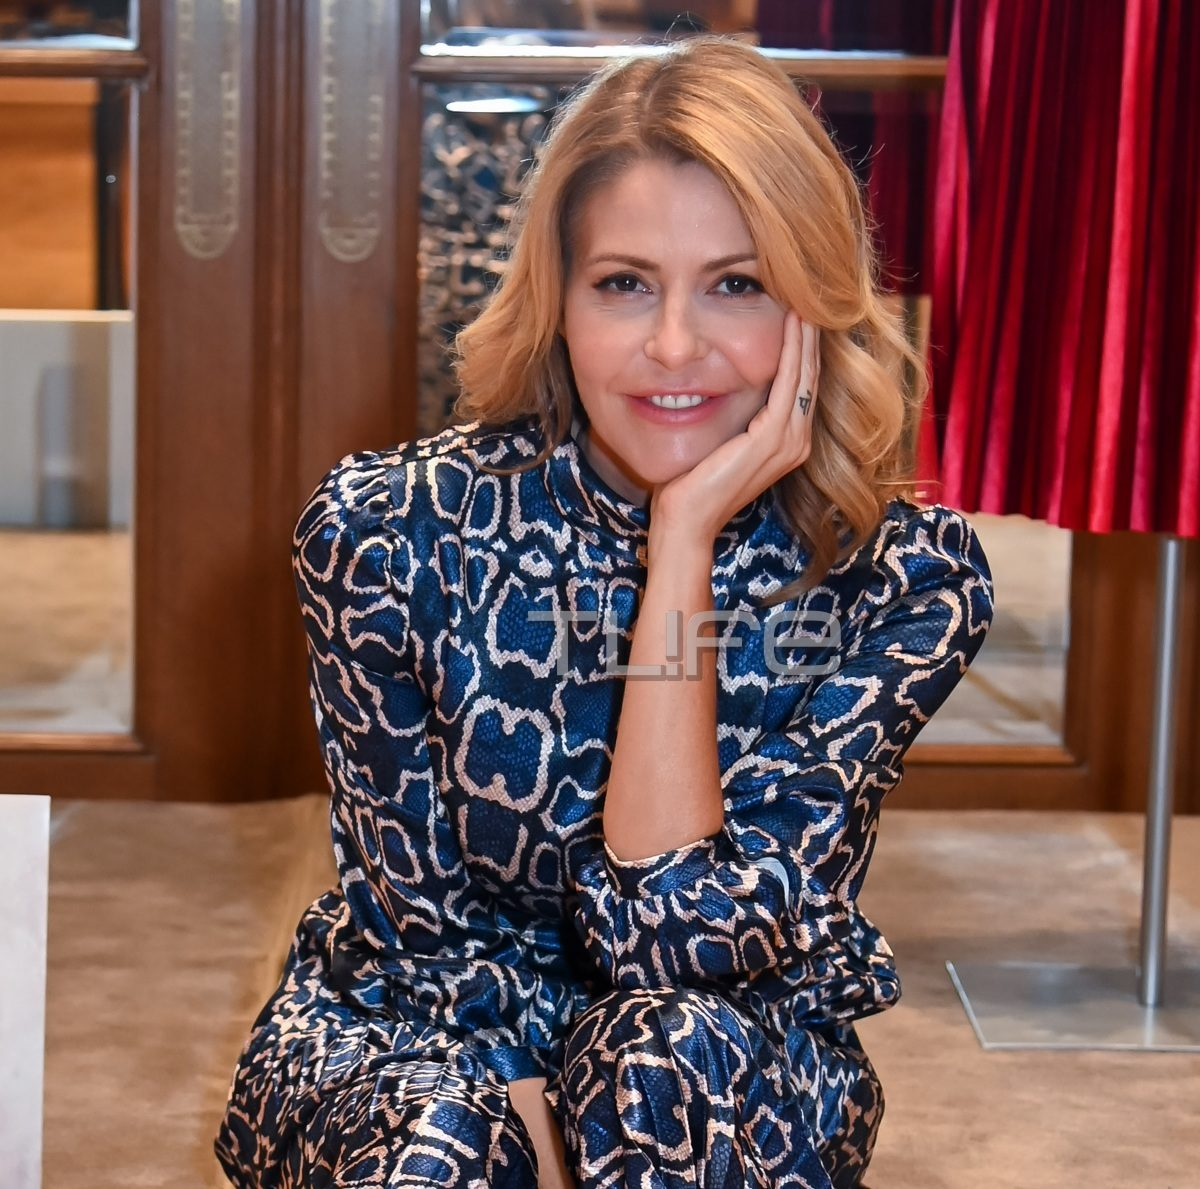 Tζένη Μπαλατσινού: Ποζάρει με τα αγαπημένα της κομμάτια απο τη νέα συλλογή γνωστού brand! Φωτογραφίες | tlife.gr